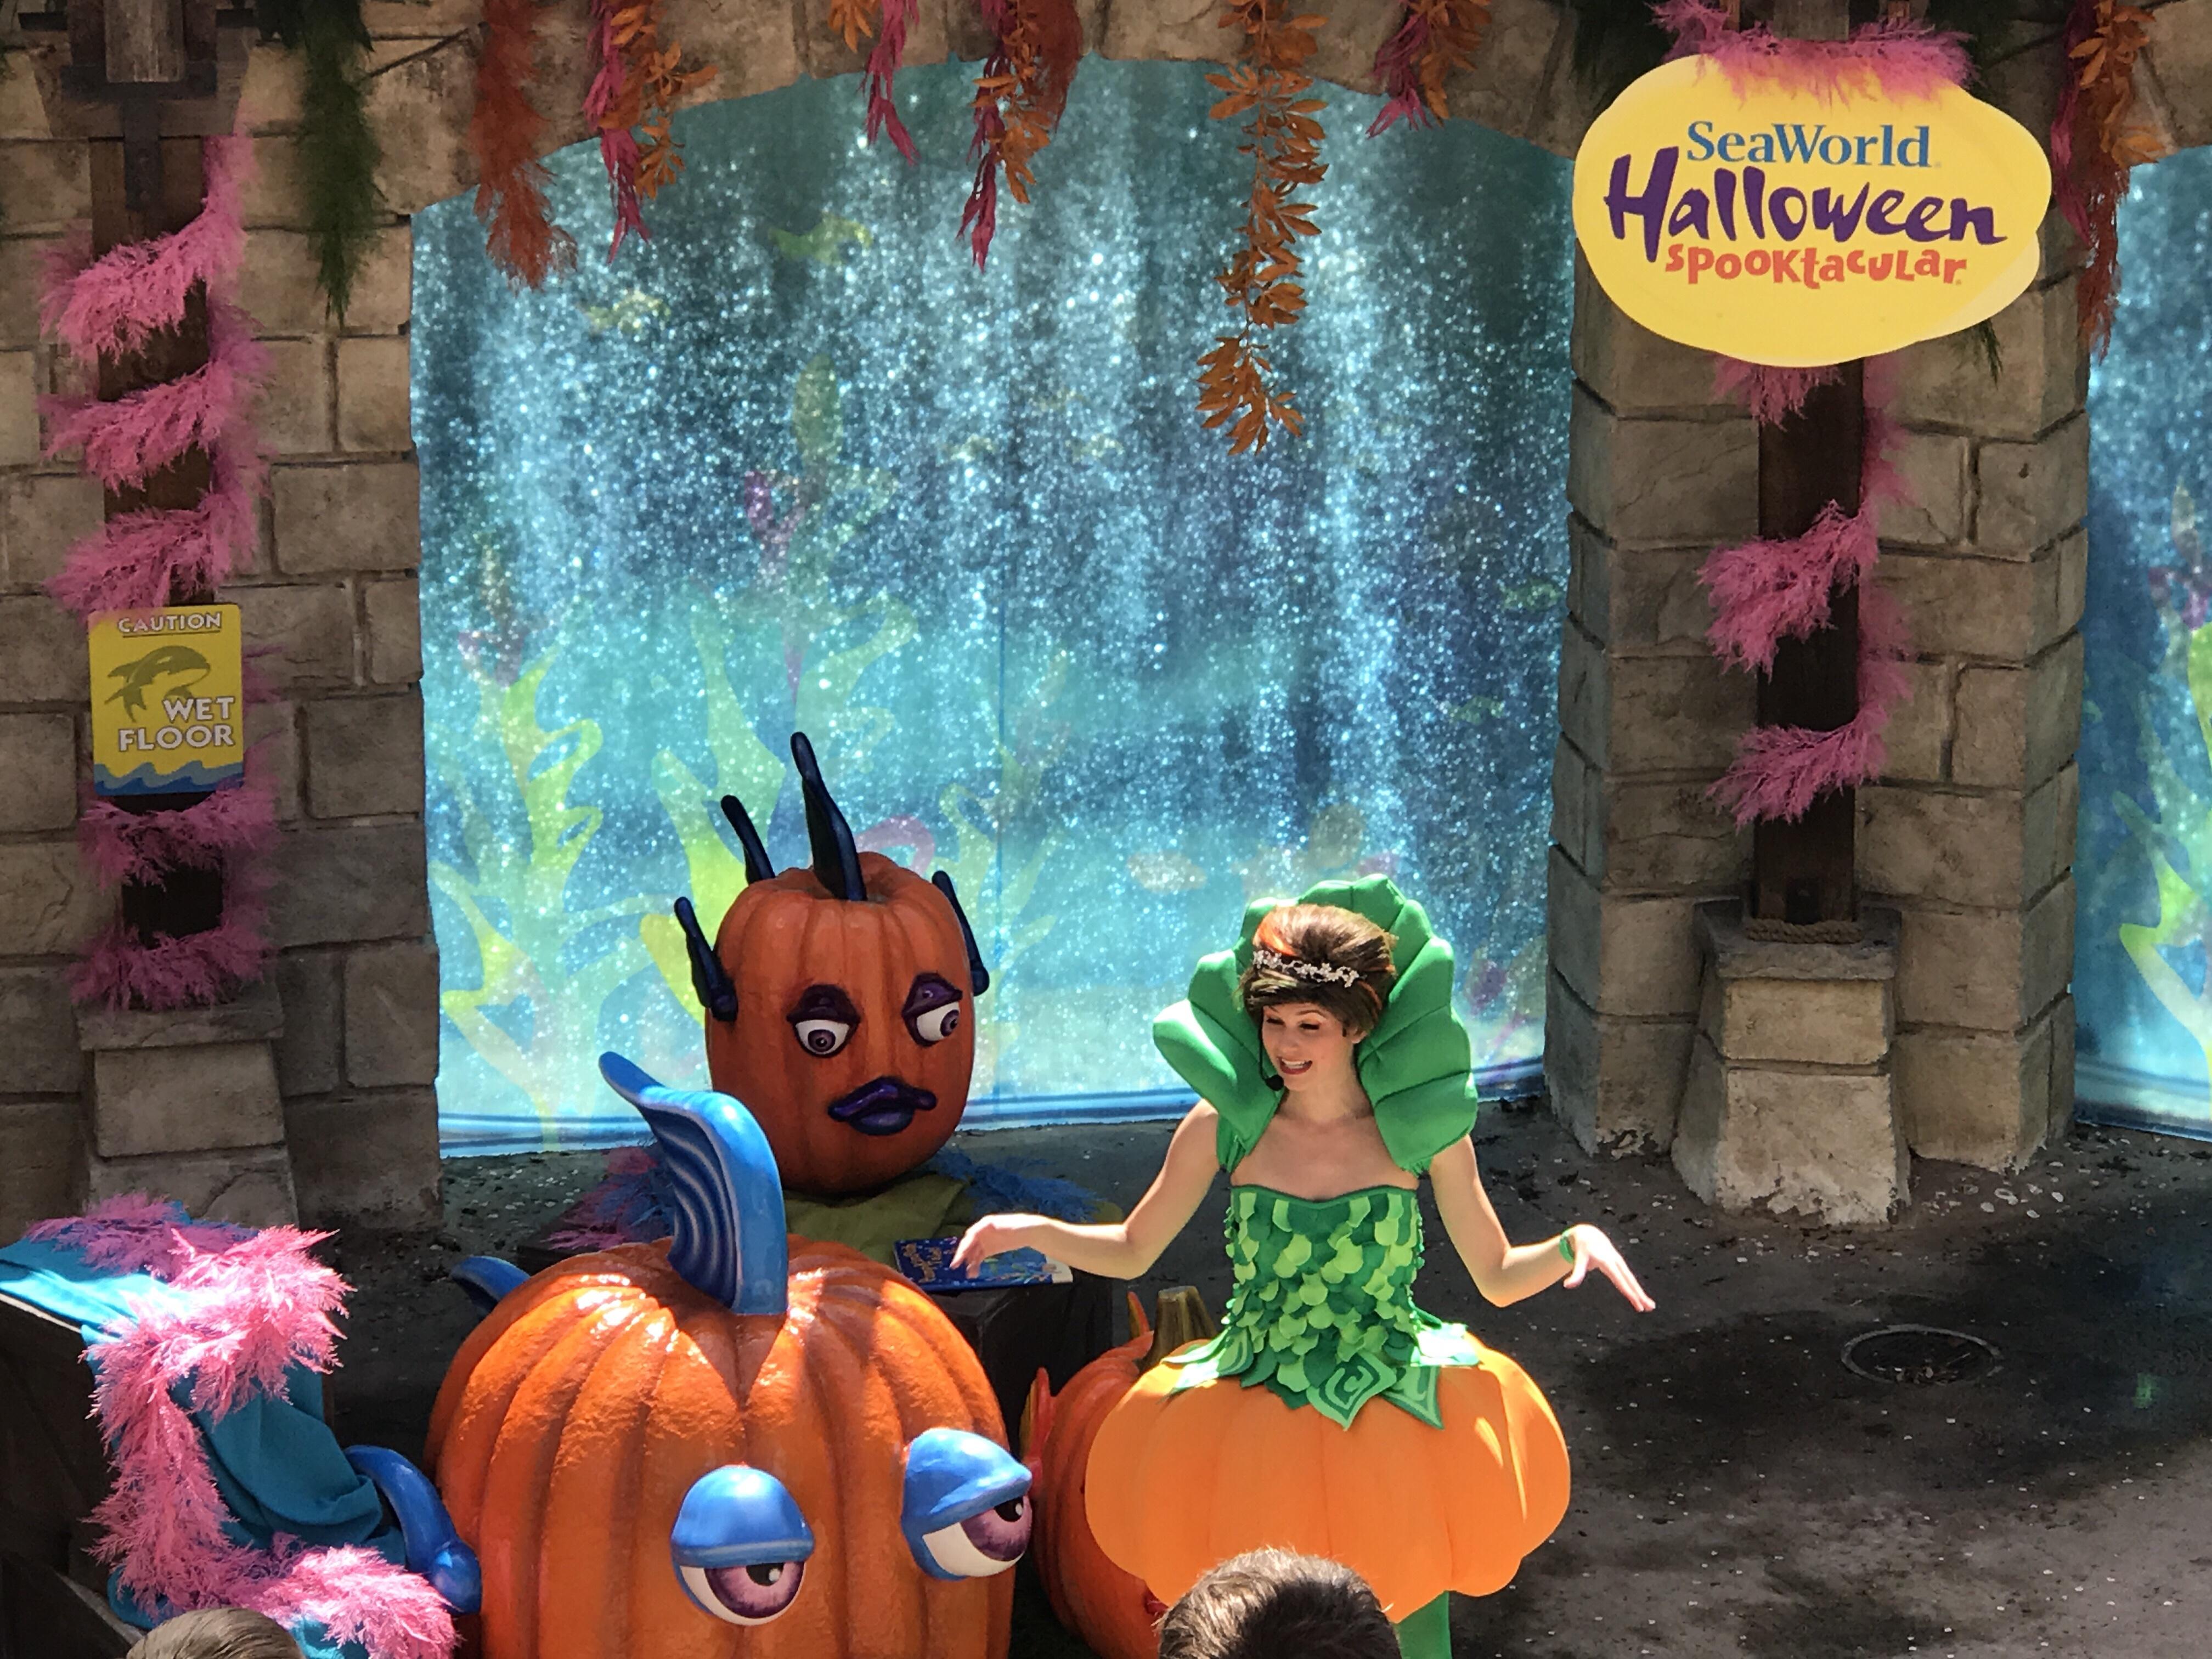 Halloween Spooktacular Seaworld.Behind The Thrills Seaworld Spooktacular Gives Candy Fun